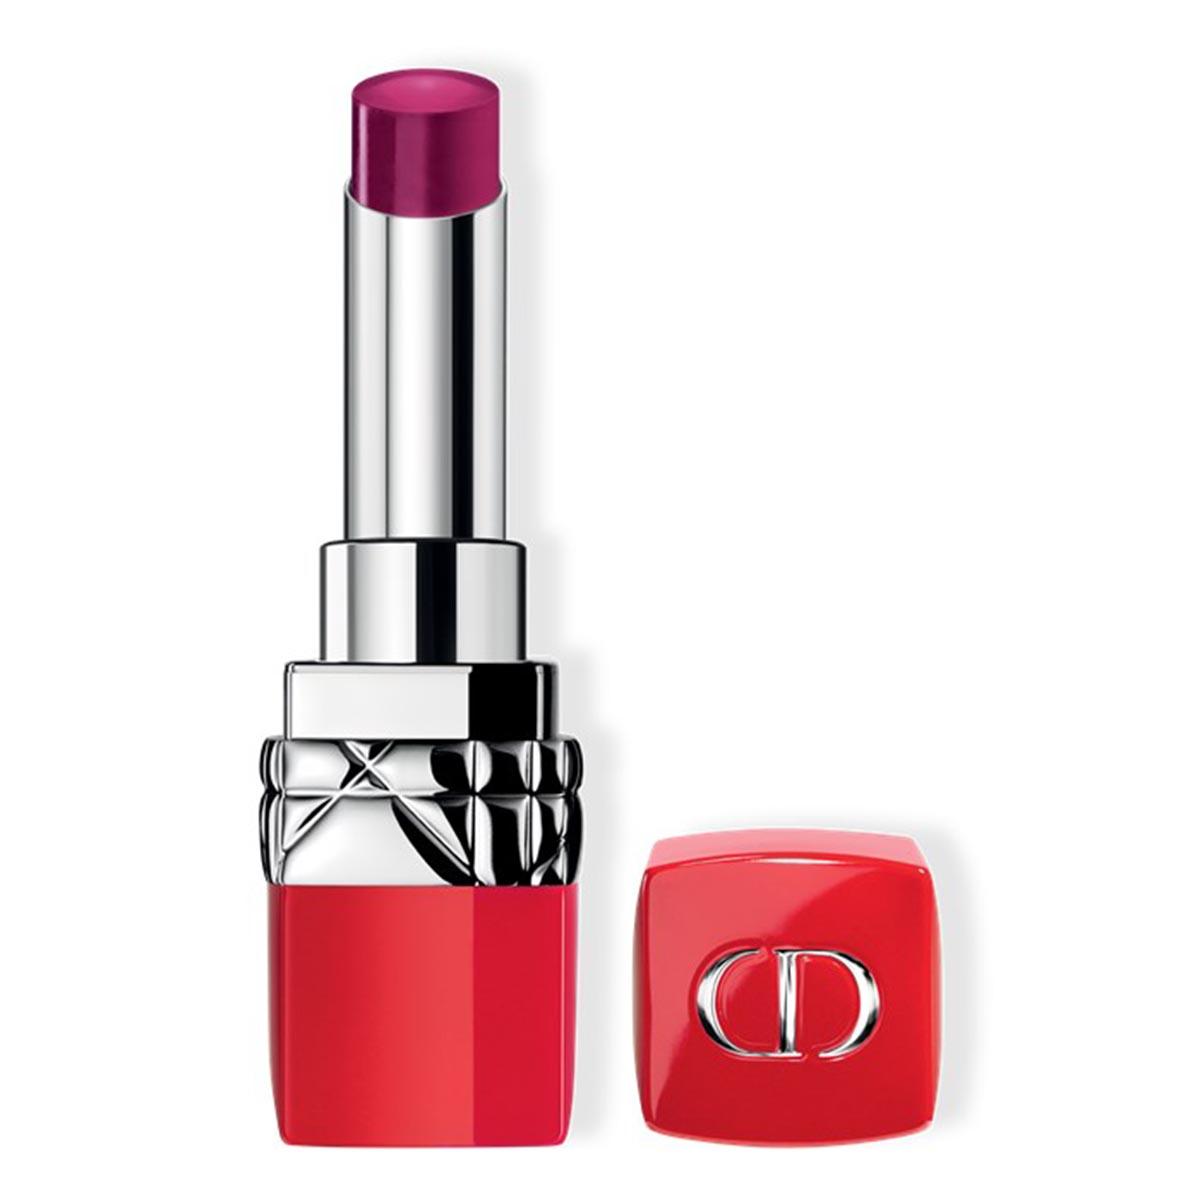 Dior rouge dior lipstick 870 ultra pulse